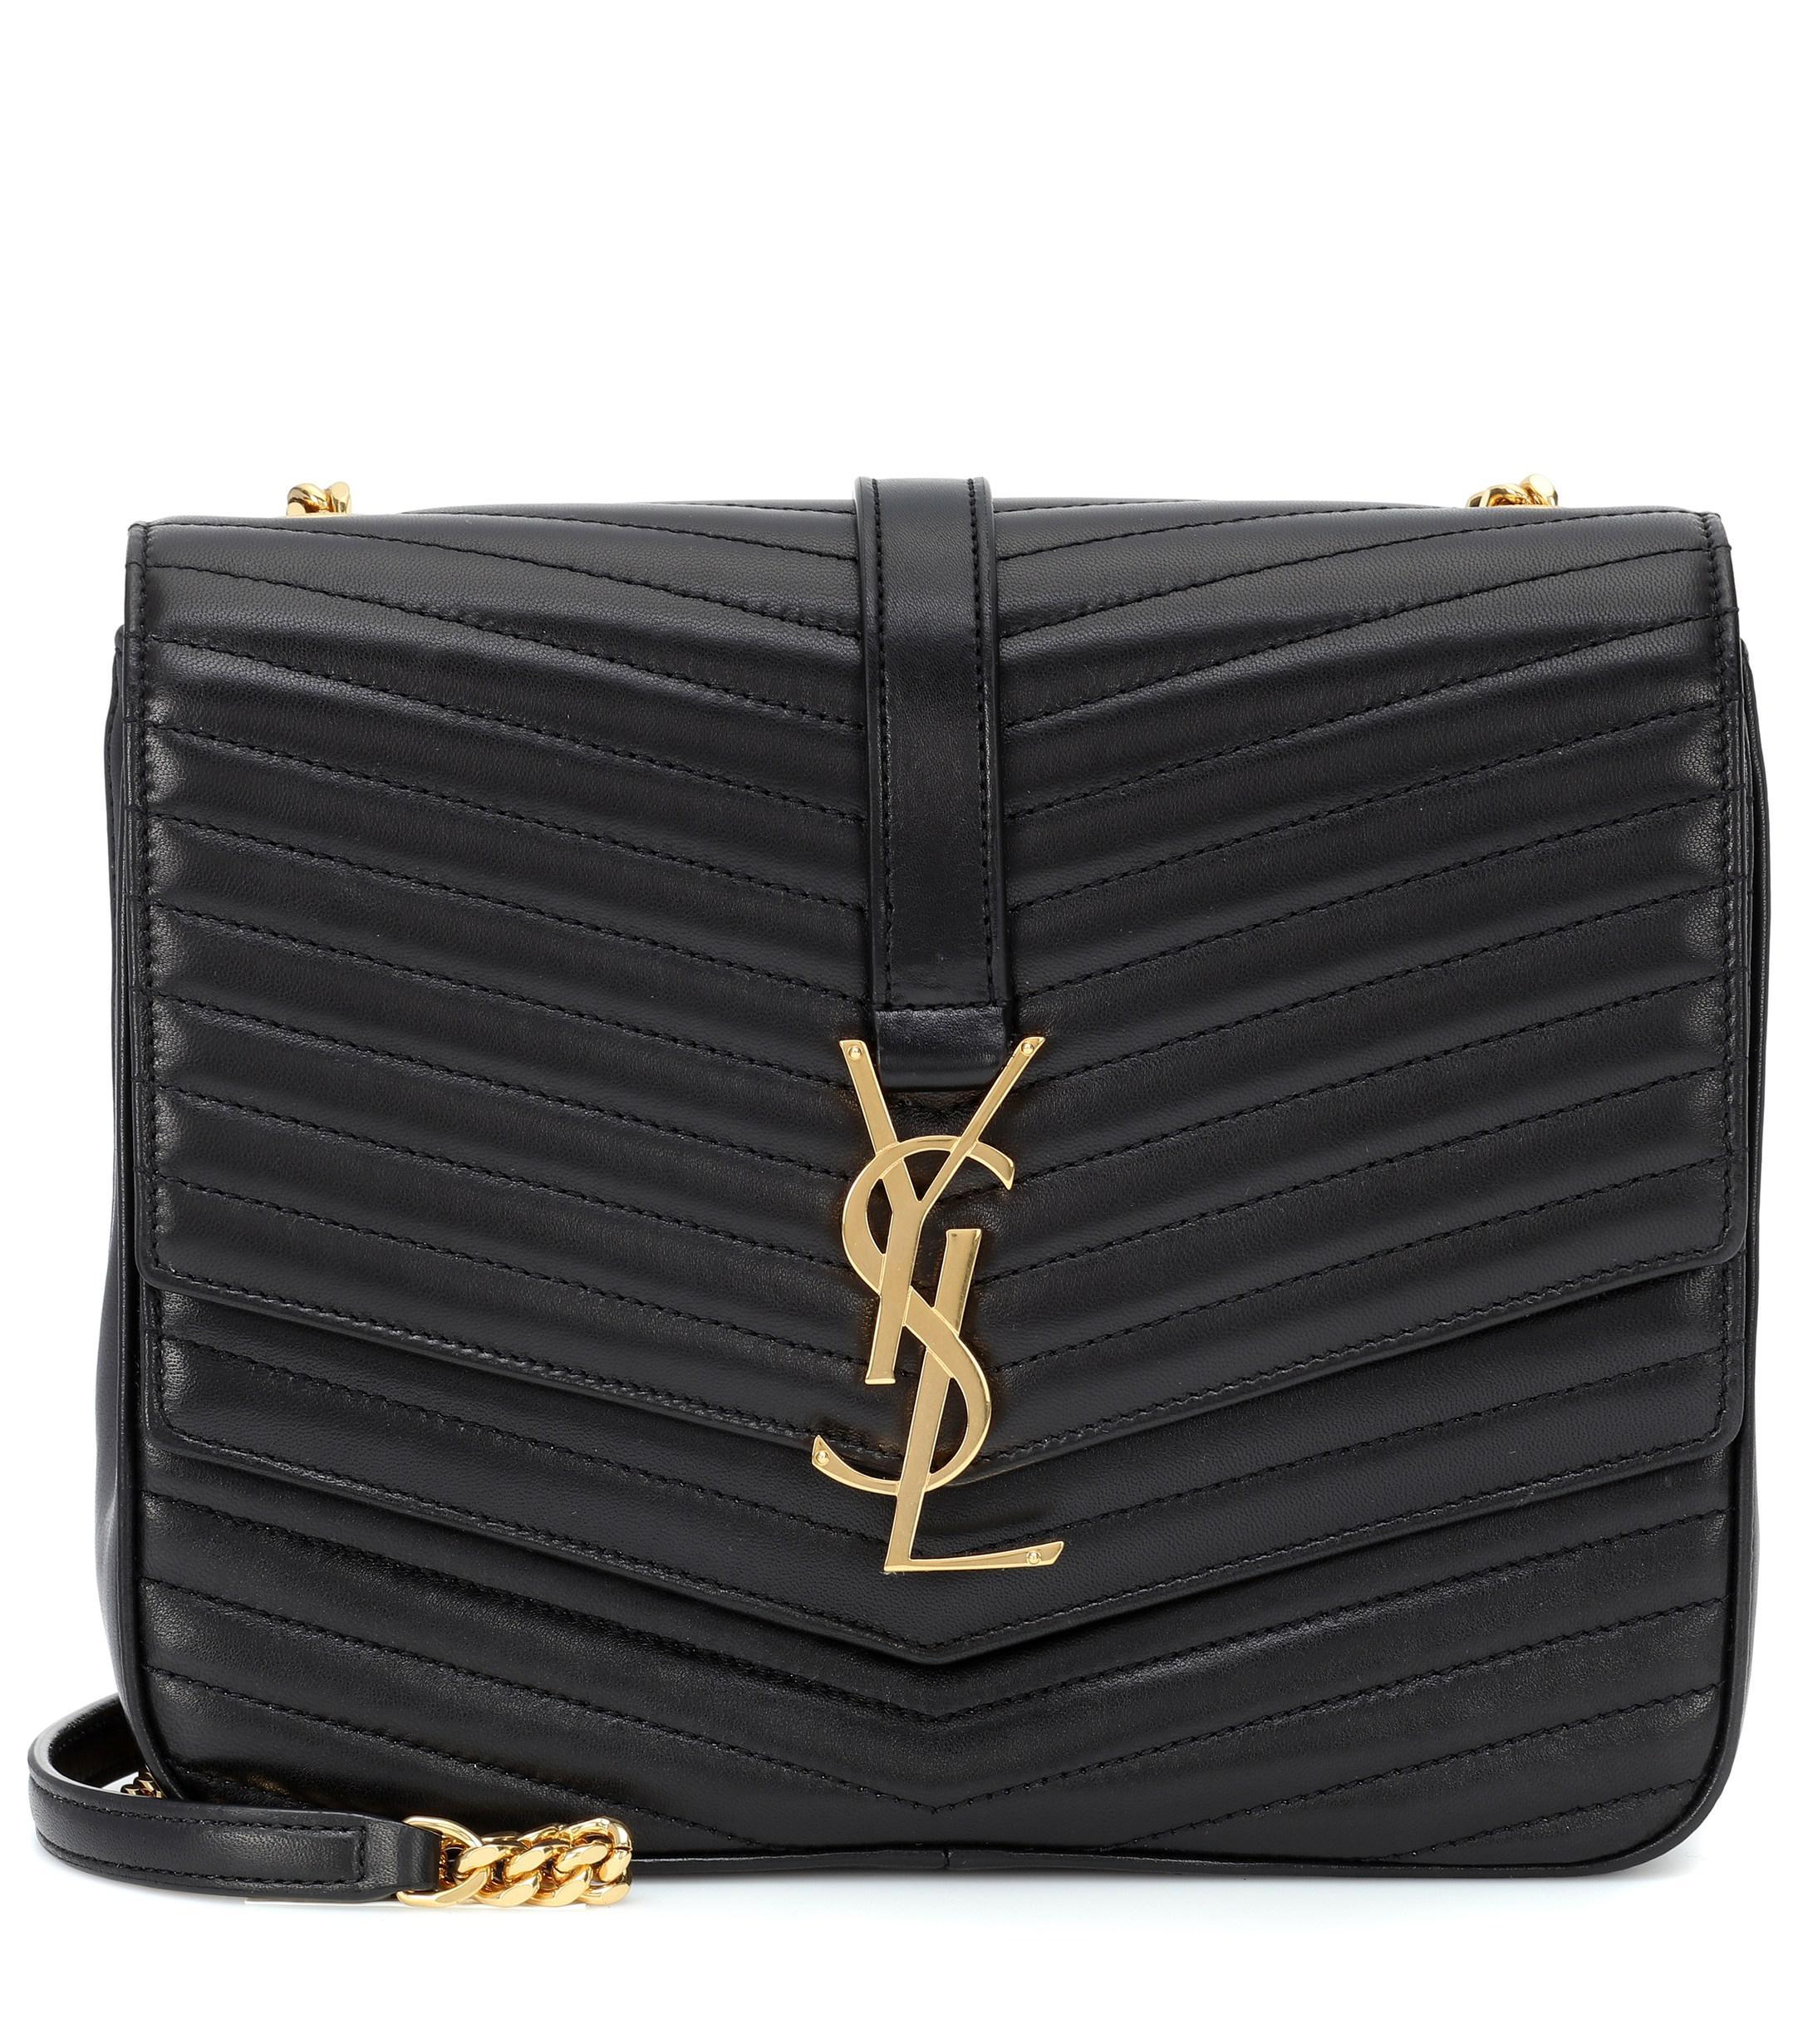 02343c47c2 Saint Laurent - Black Sulpice Medium Leather Shoulder Bag - Lyst. View  fullscreen